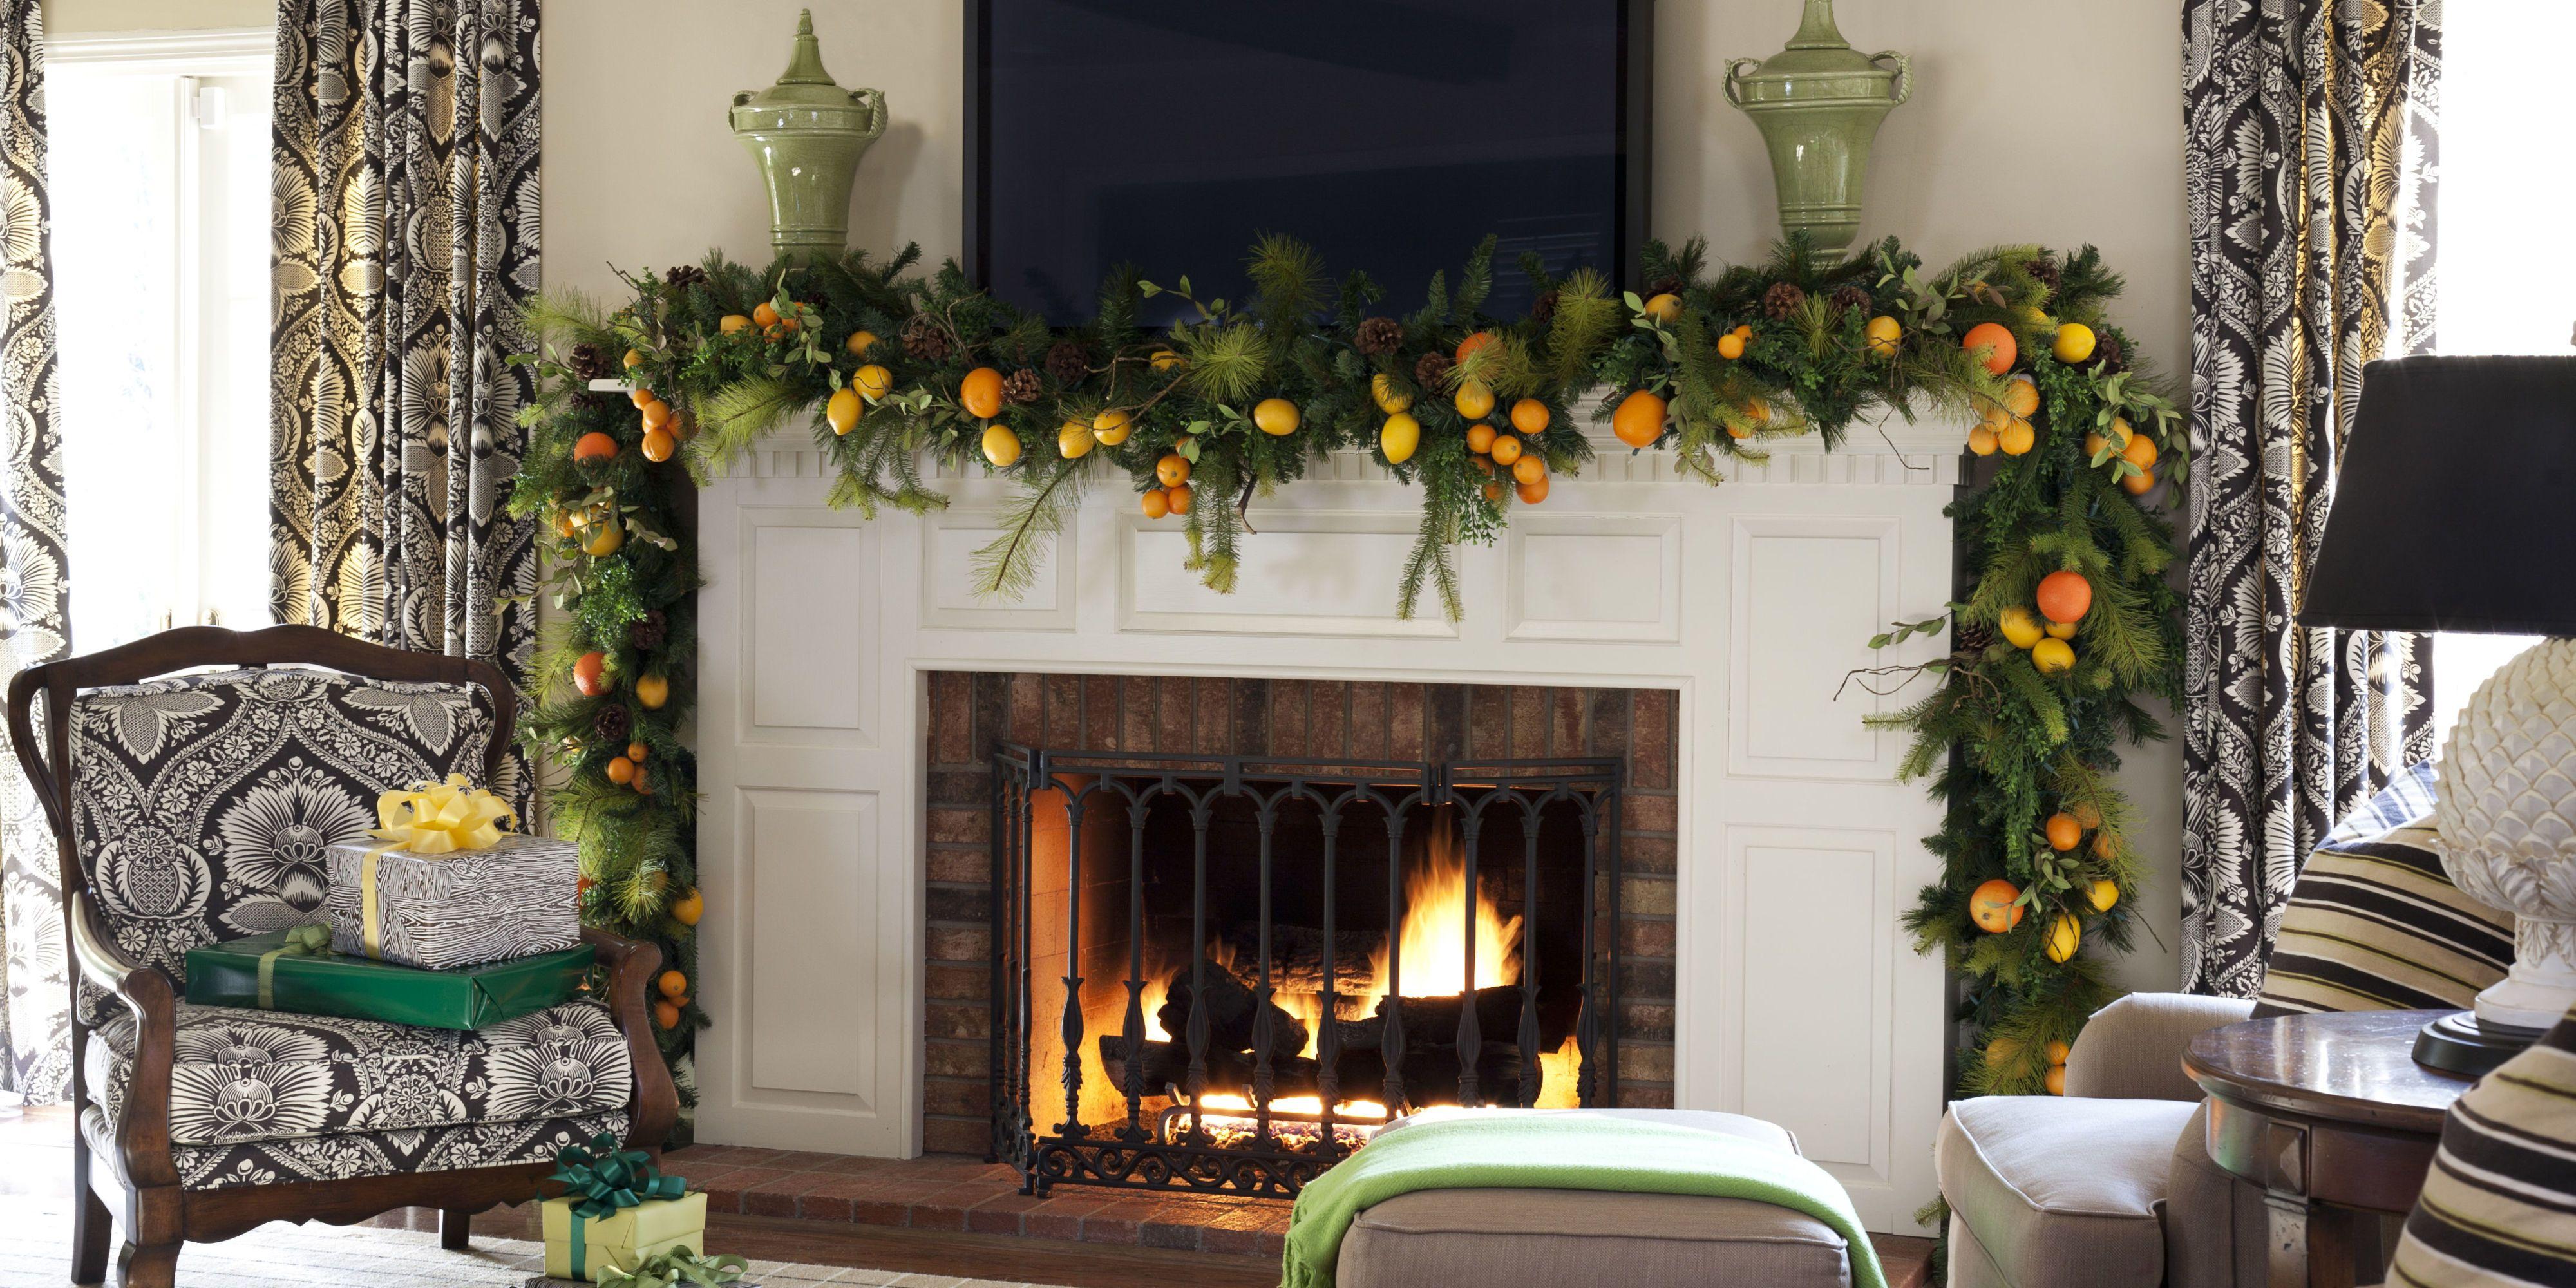 image & 20+ Best Christmas Decorating Ideas - Tips For Stylish Holiday ...